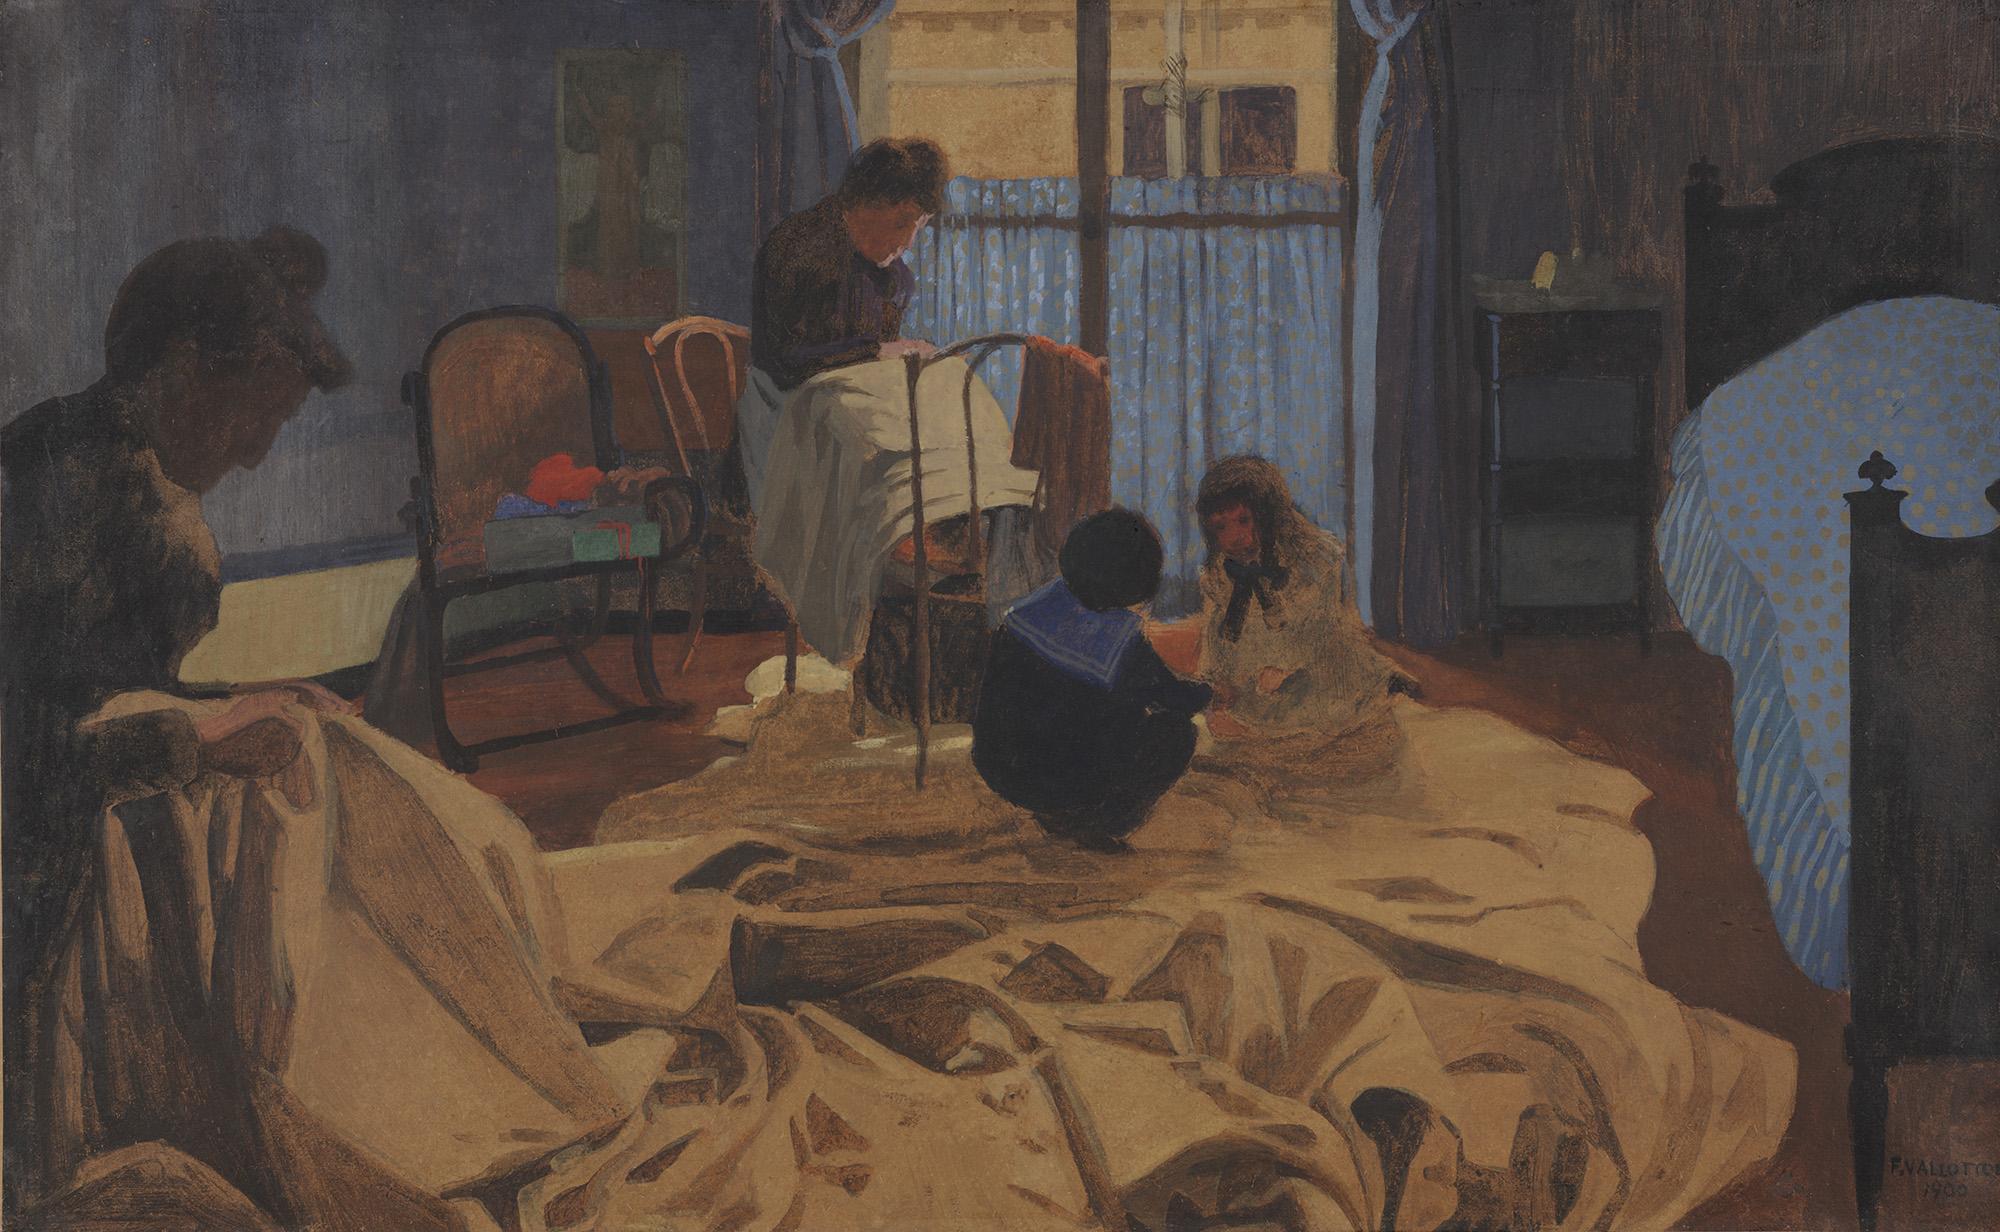 The Laundress, Blue Room, 1900 - Felix Vallotton - WikiArt.org